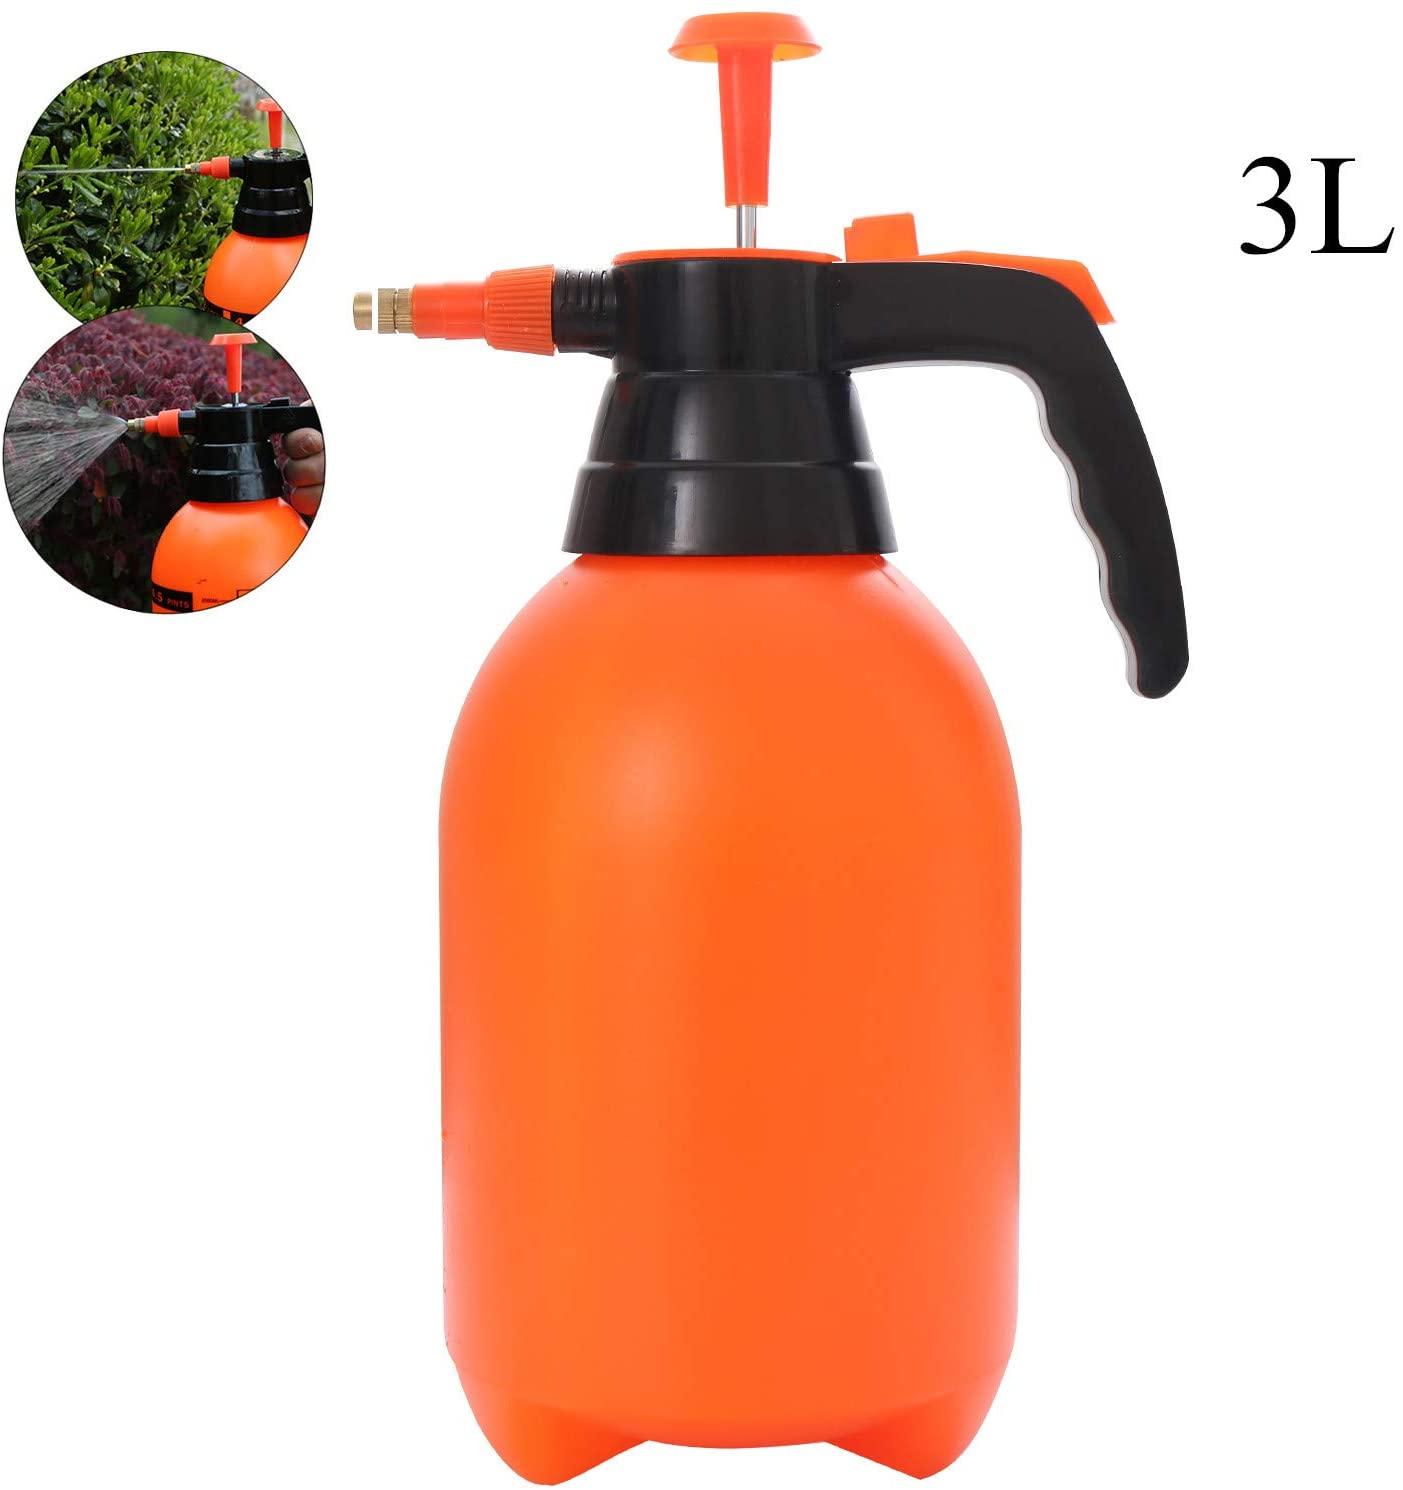 Garden Sprayer Lawn Sprayer for Spraying /Watering/Home Cleaning/Car Washing (3L)